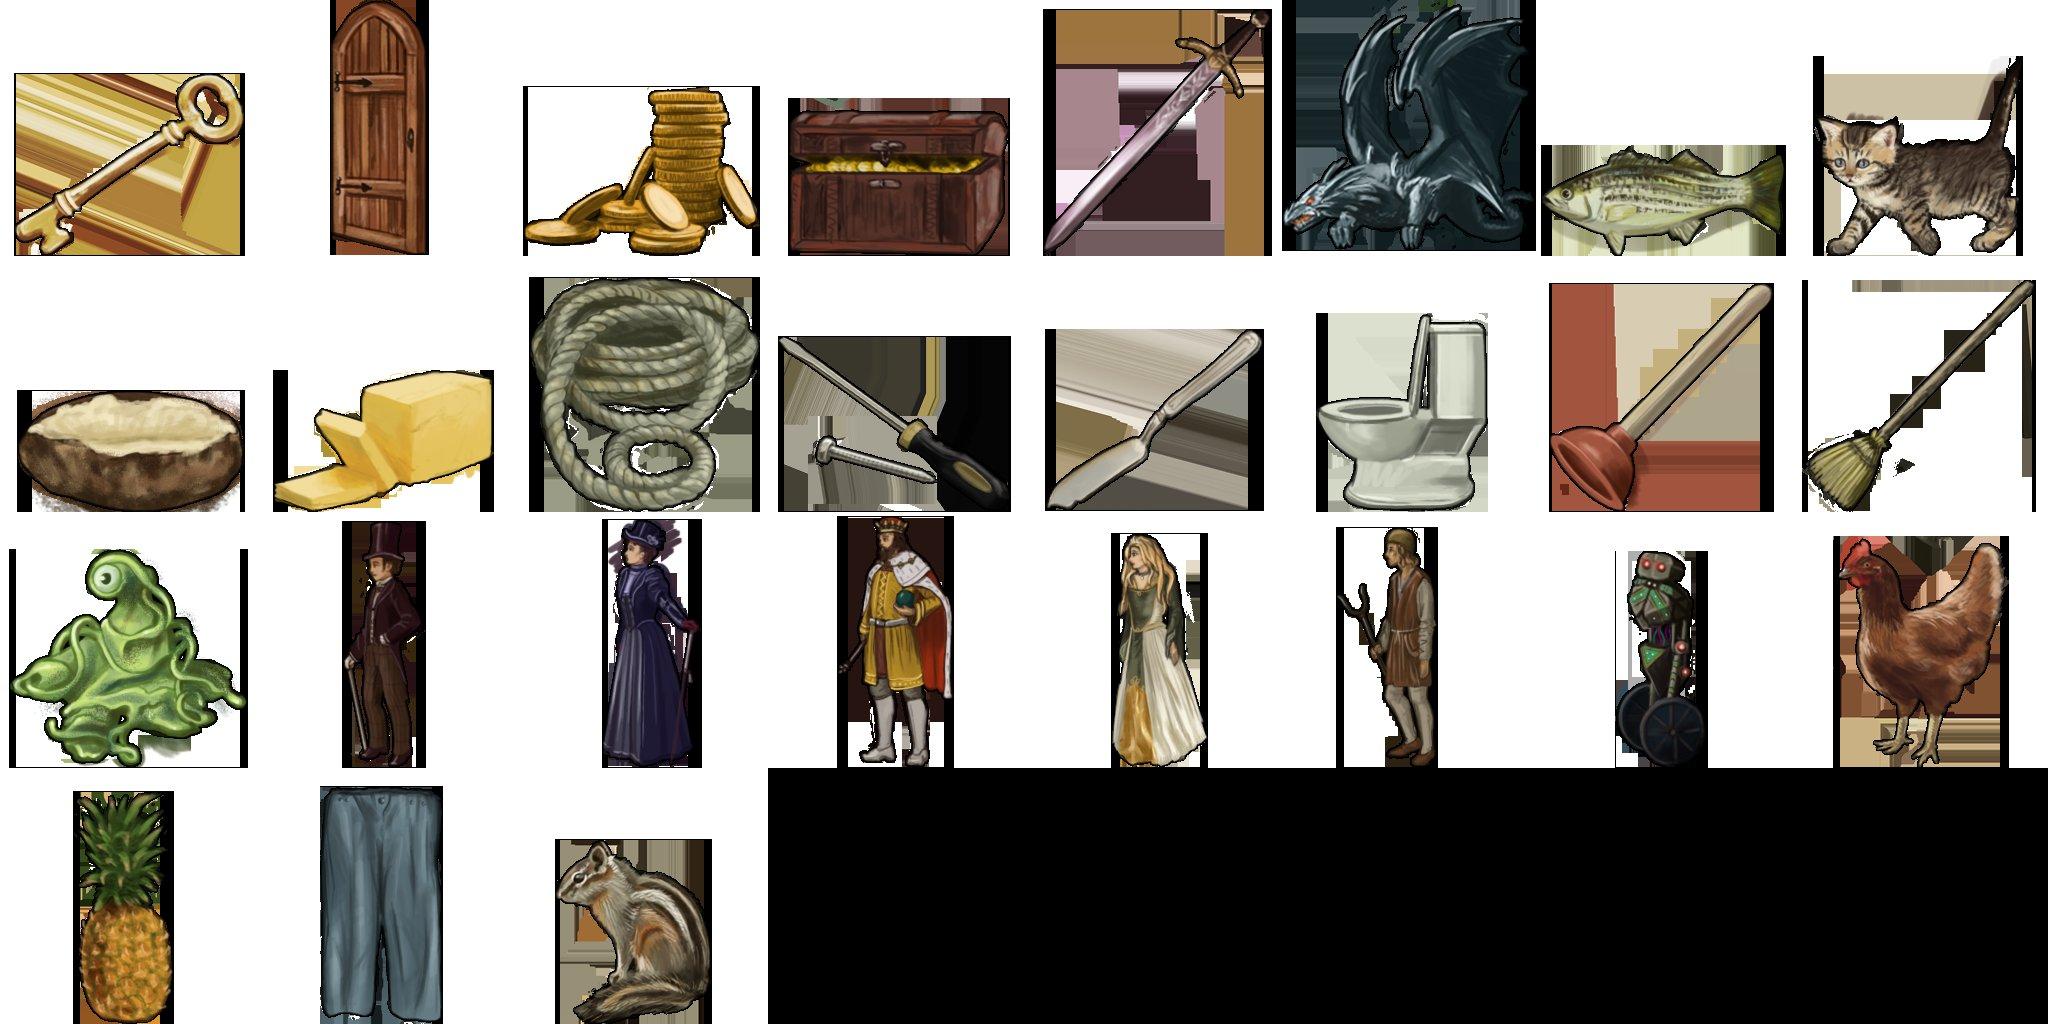 2048x1024 > ADventure Lib Wallpapers